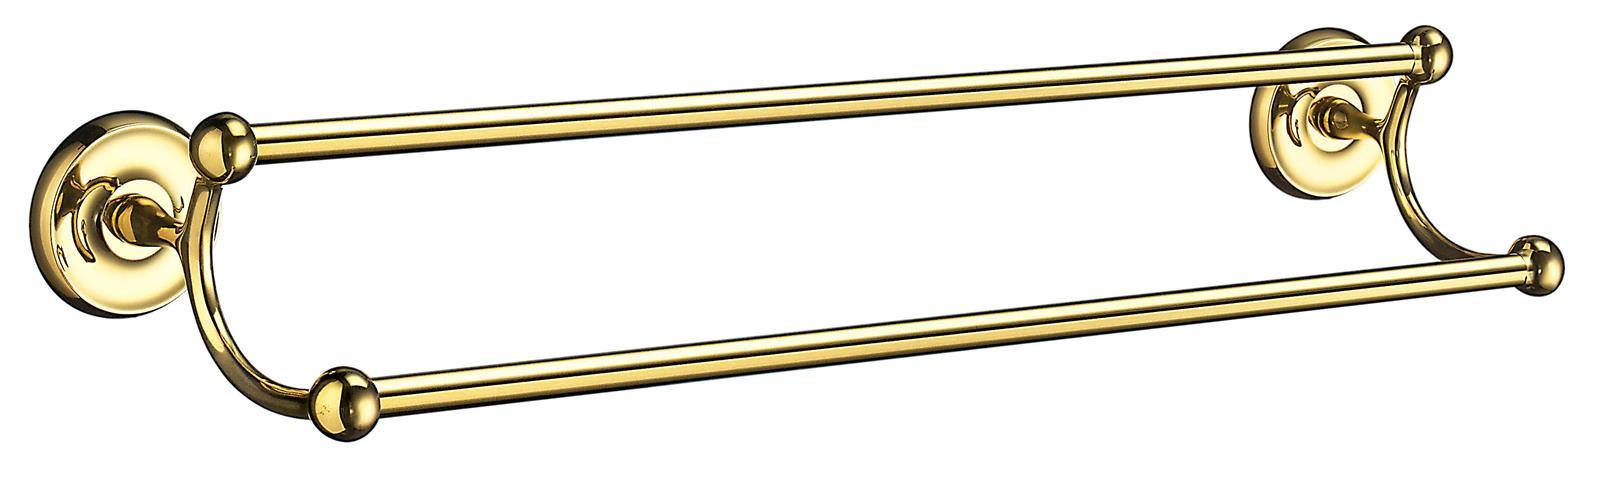 SMEDBO VILLA Doppelte Handtuchstange, L 635 mm Messing poliert